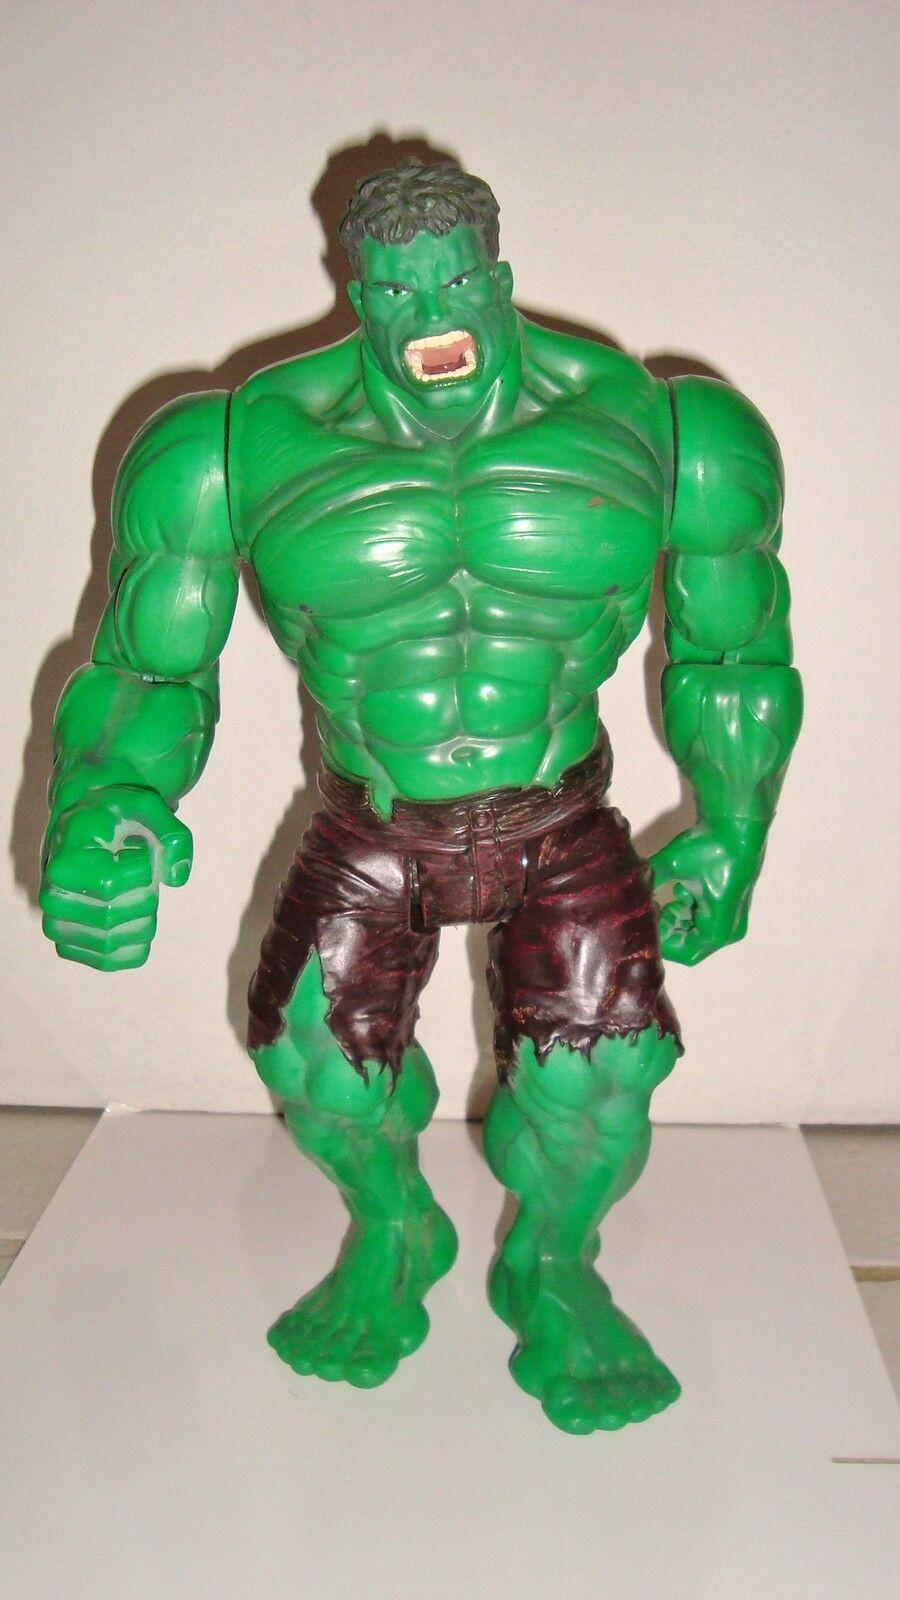 Sehr Große Figürchen Figürchen Figürchen The Hulk Film 2002 Avengers Artikuliert Klangreich (33x20cm 5824ad